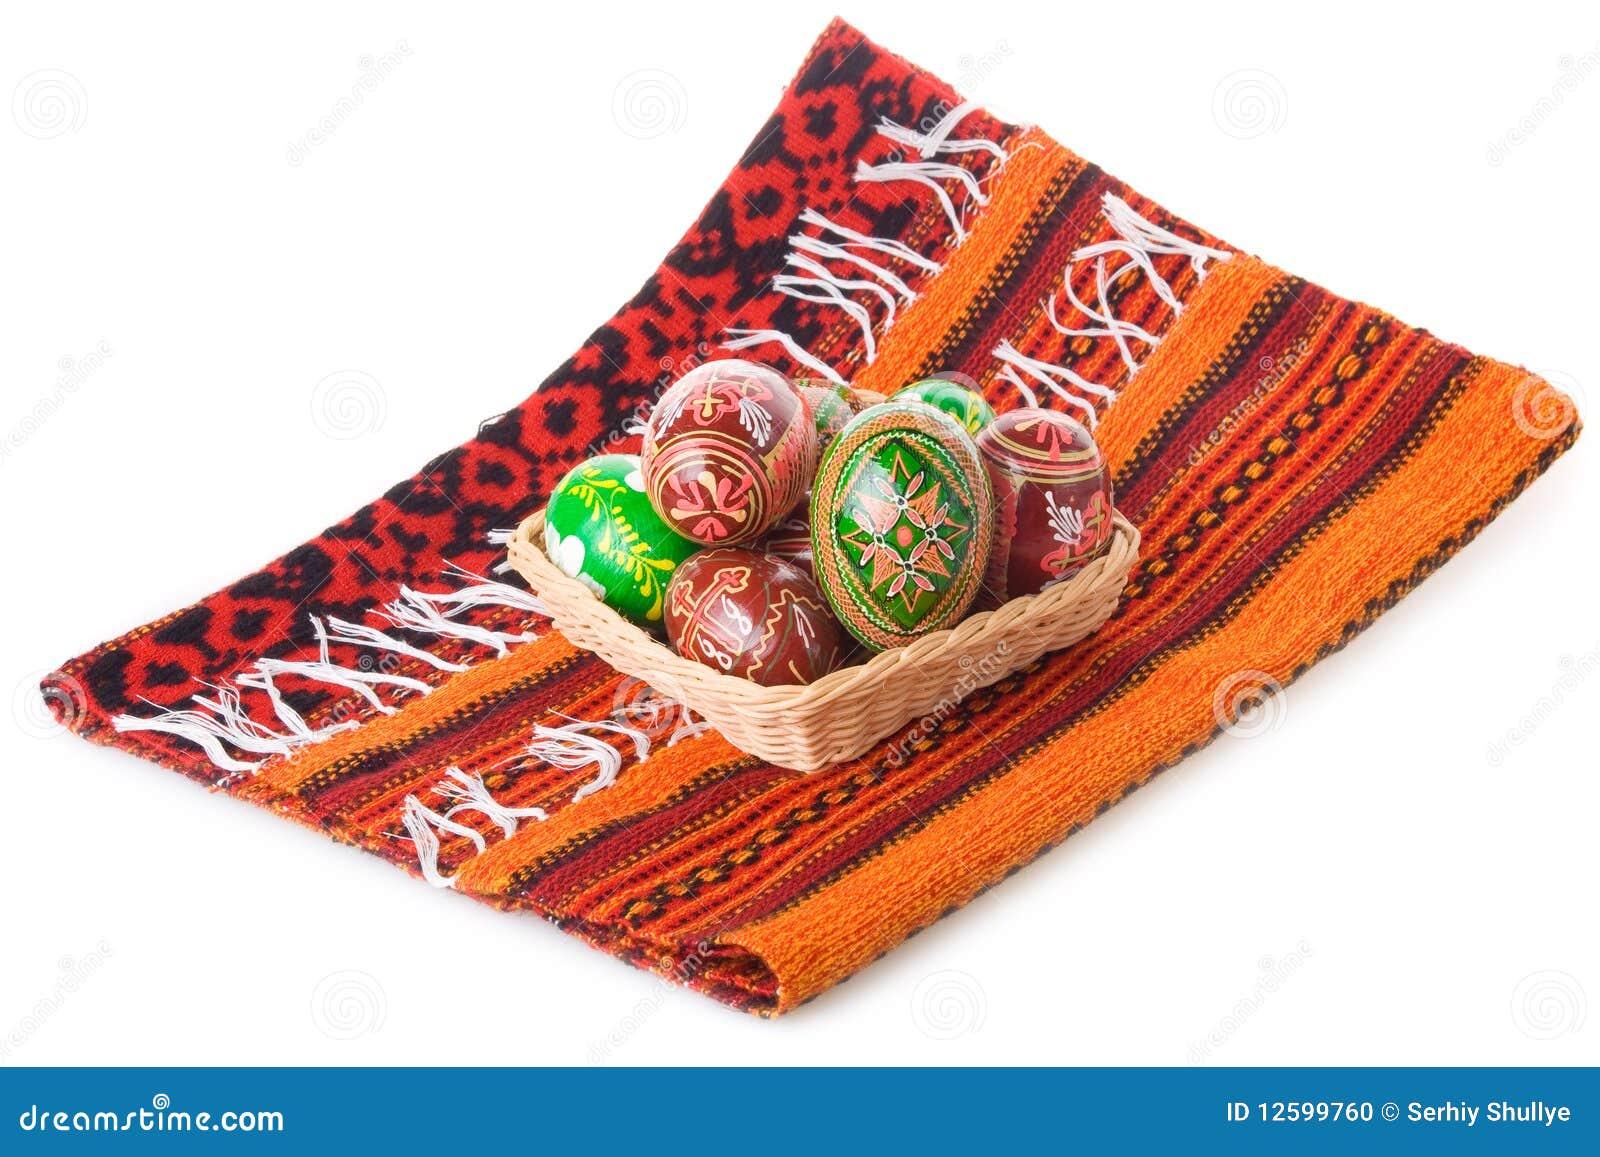 Towel Art Basket : Painted easter eggs in basket on towel stock photo image